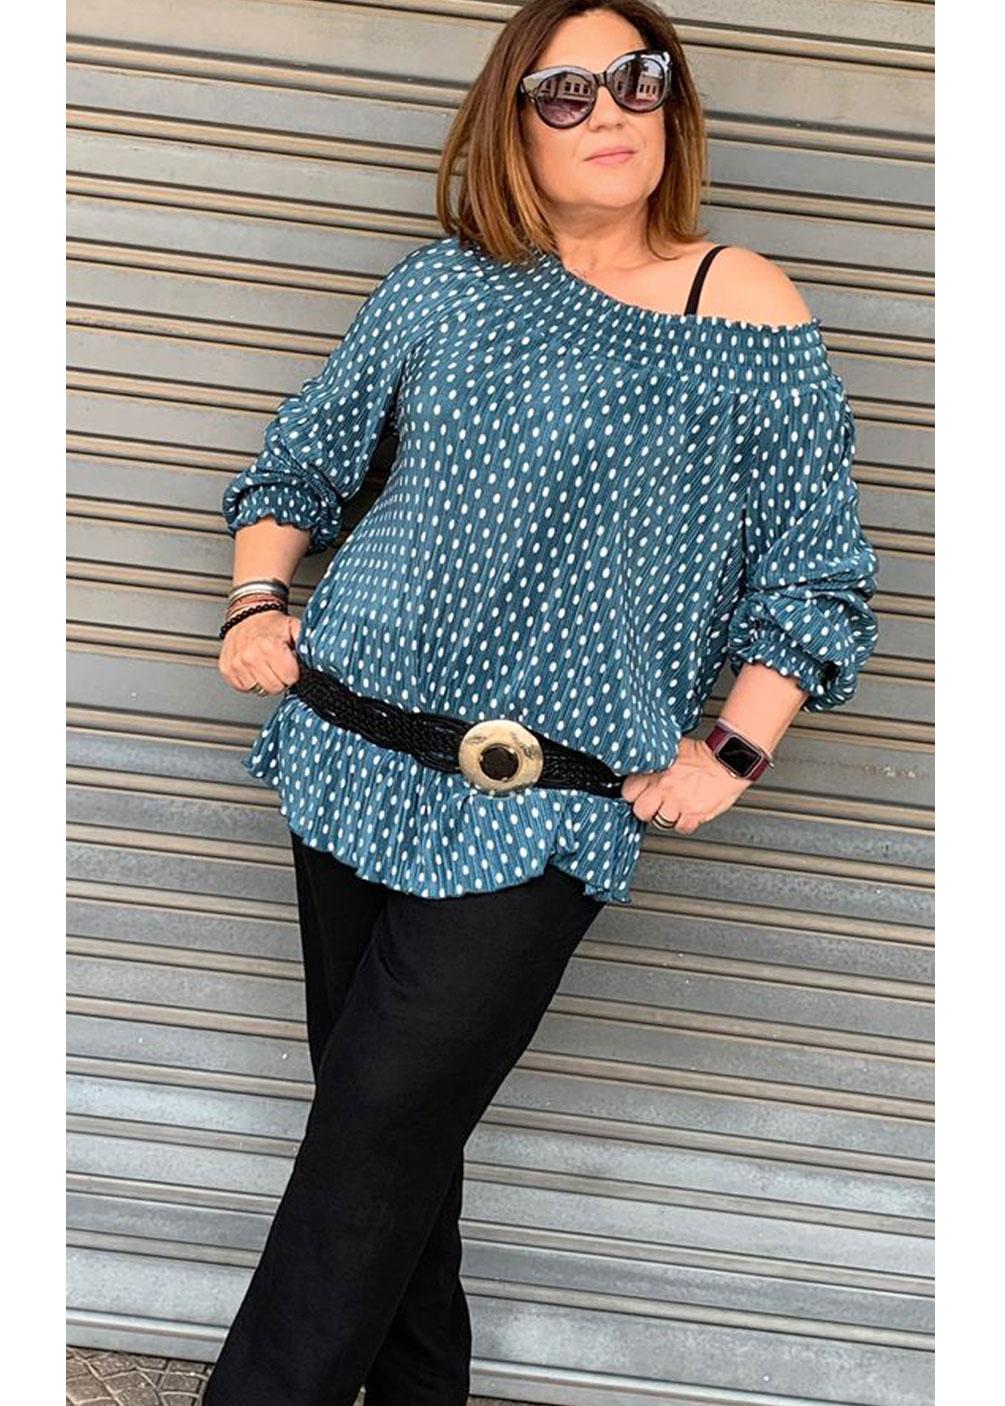 blusa lunares topos mejicana hombros tallas grandes curvy ideal comoda fresquita